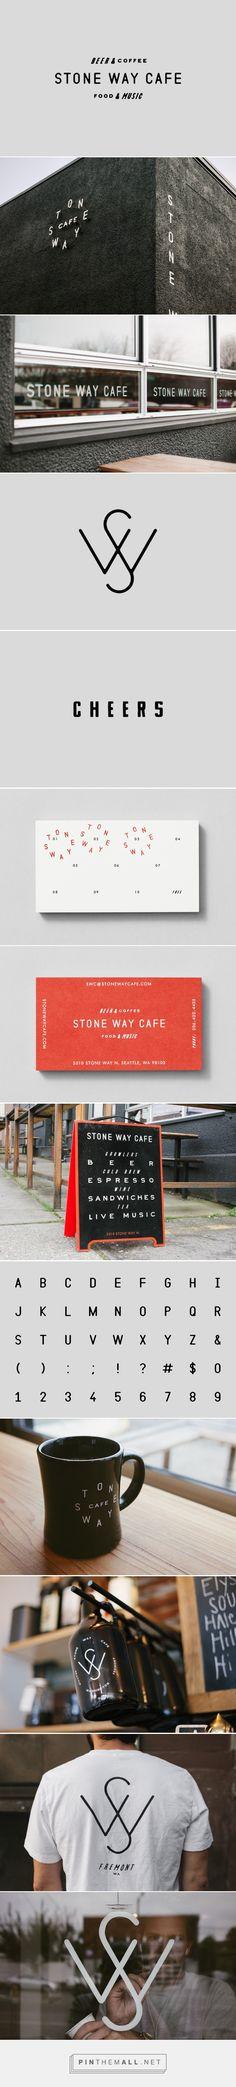 New Logo for Stone Way Cafe by Shore — BP&O - restaurant branding identity design